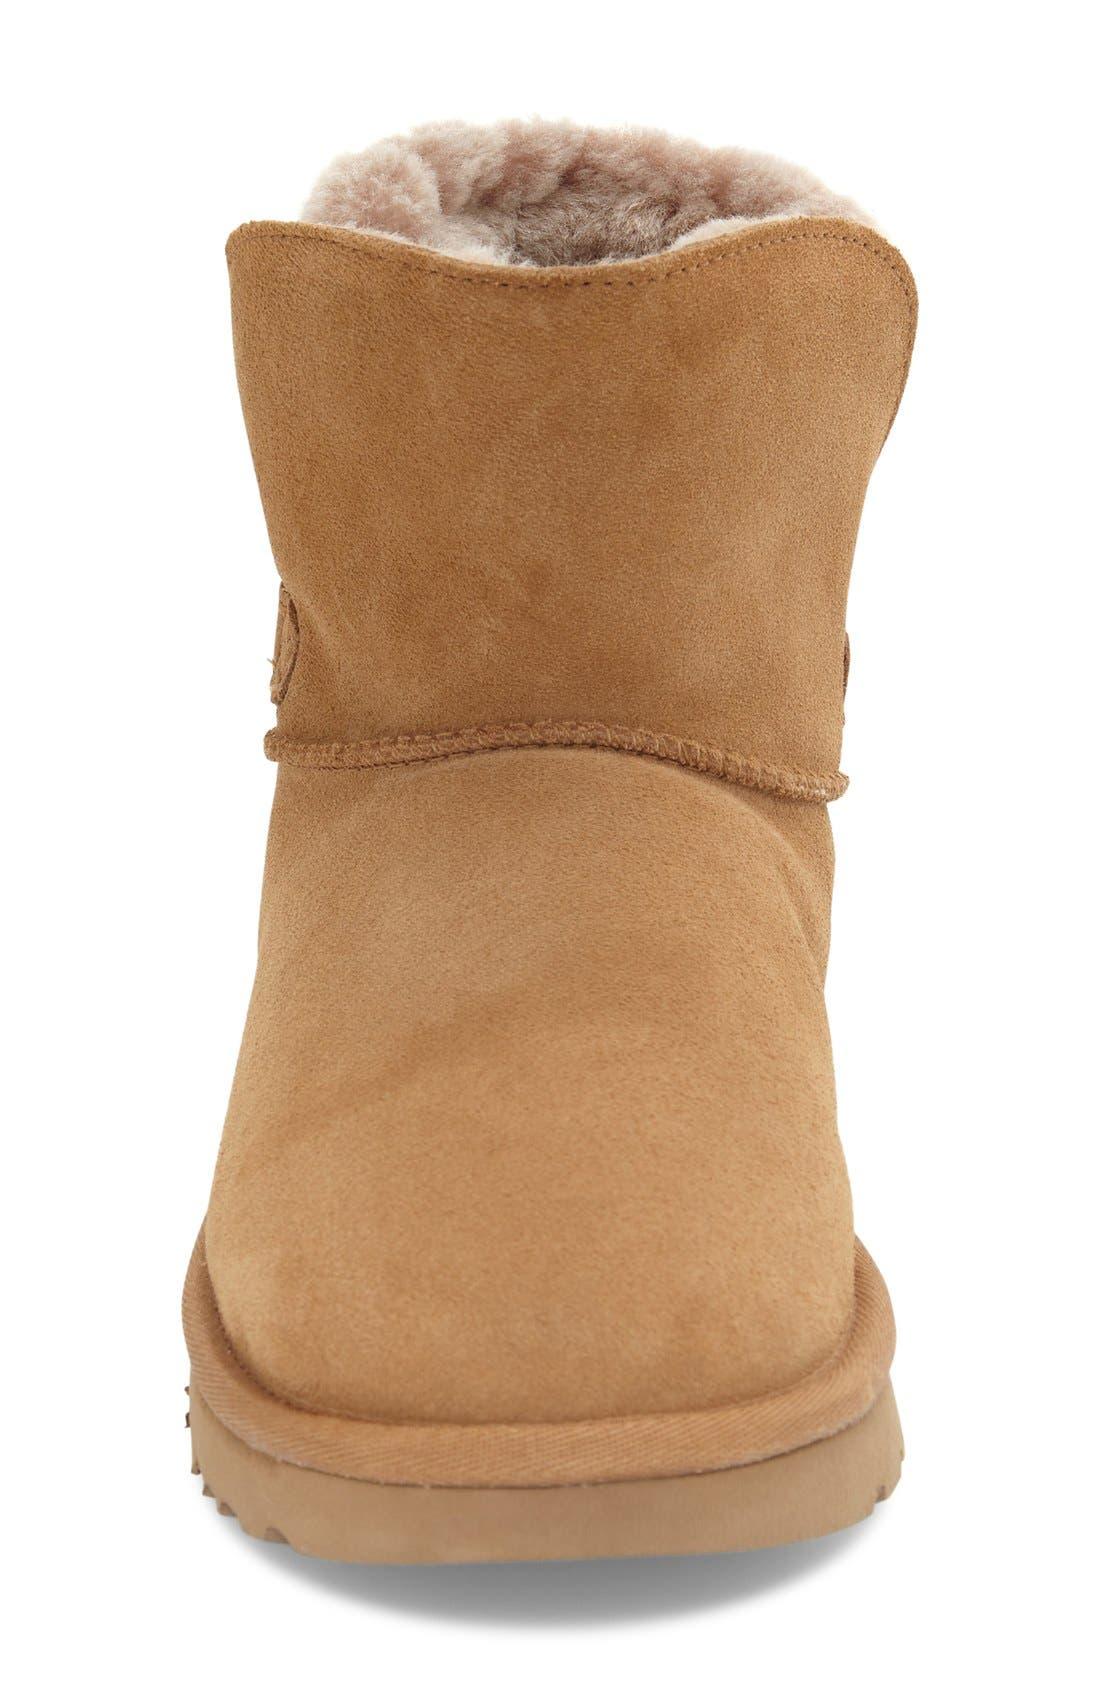 Alternate Image 3  - UGG 'Adria' Boot (Women)